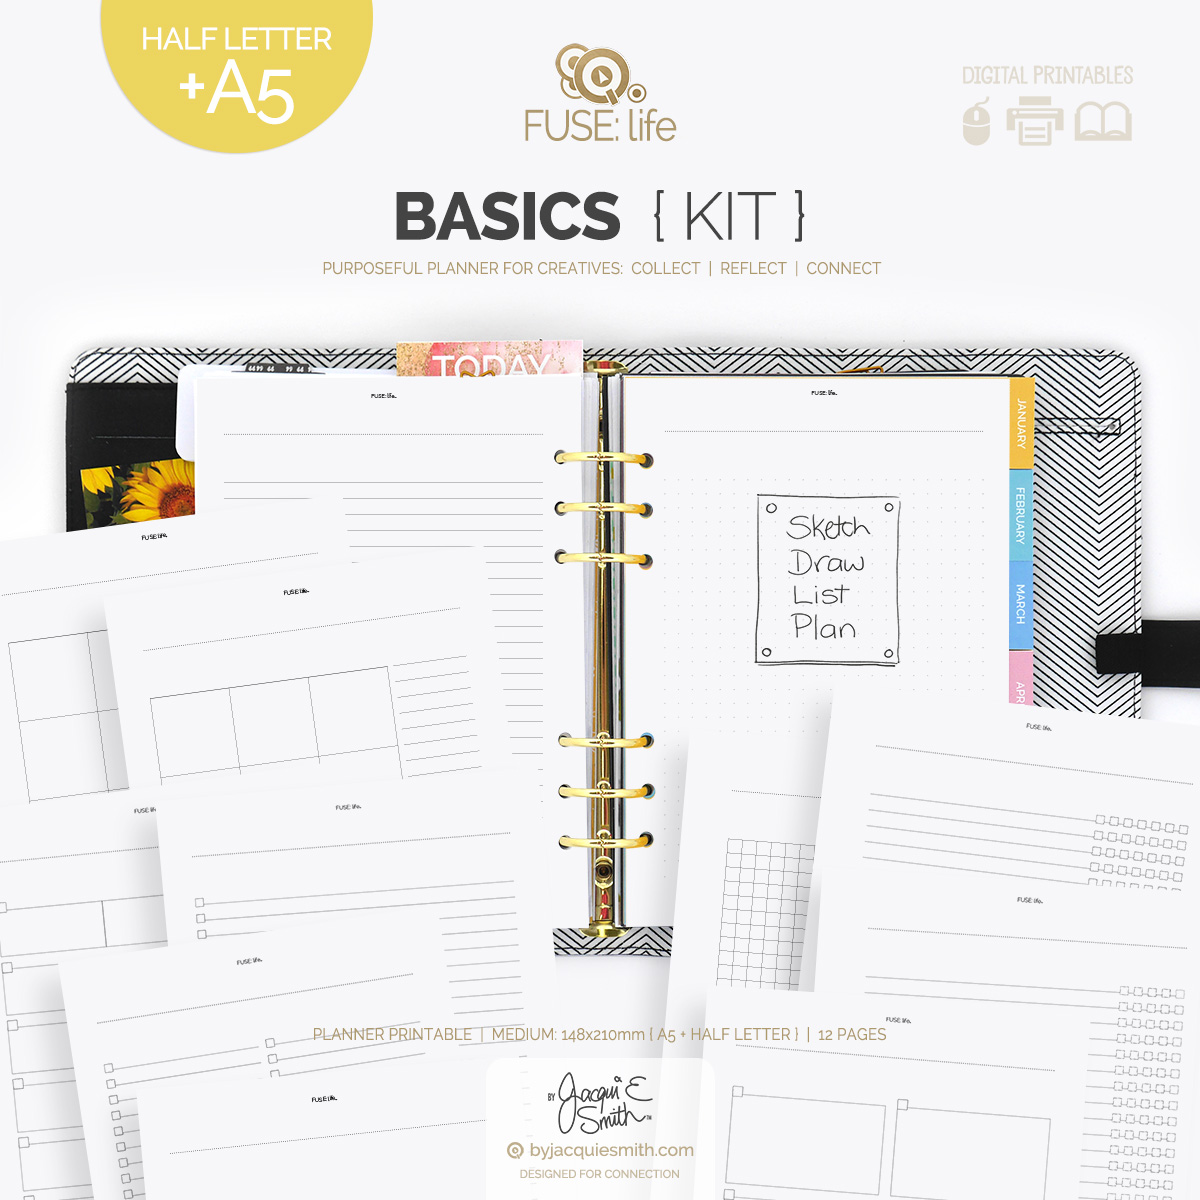 FUSE:life Basics Kit planner printables : A5 + Half Letter at byjacquiesmith.com